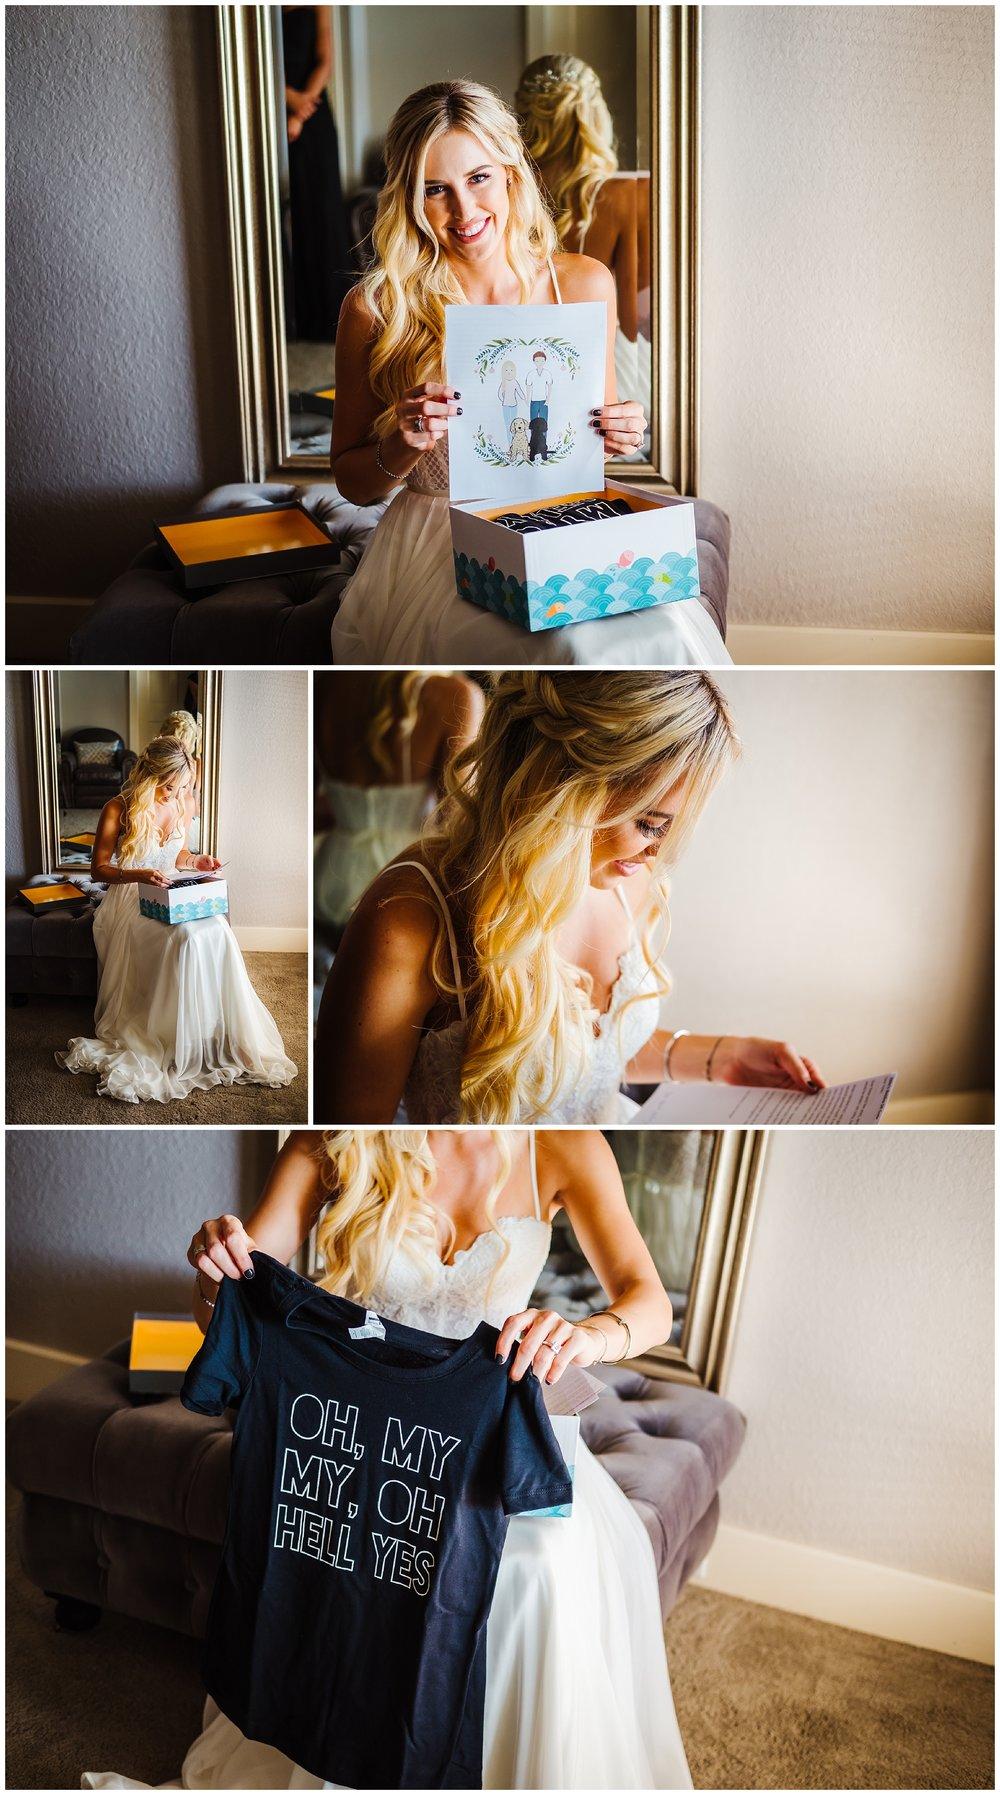 st-pete-wedding-photographer-backyard-luxury-snell-isle-vinoy_0012.jpg